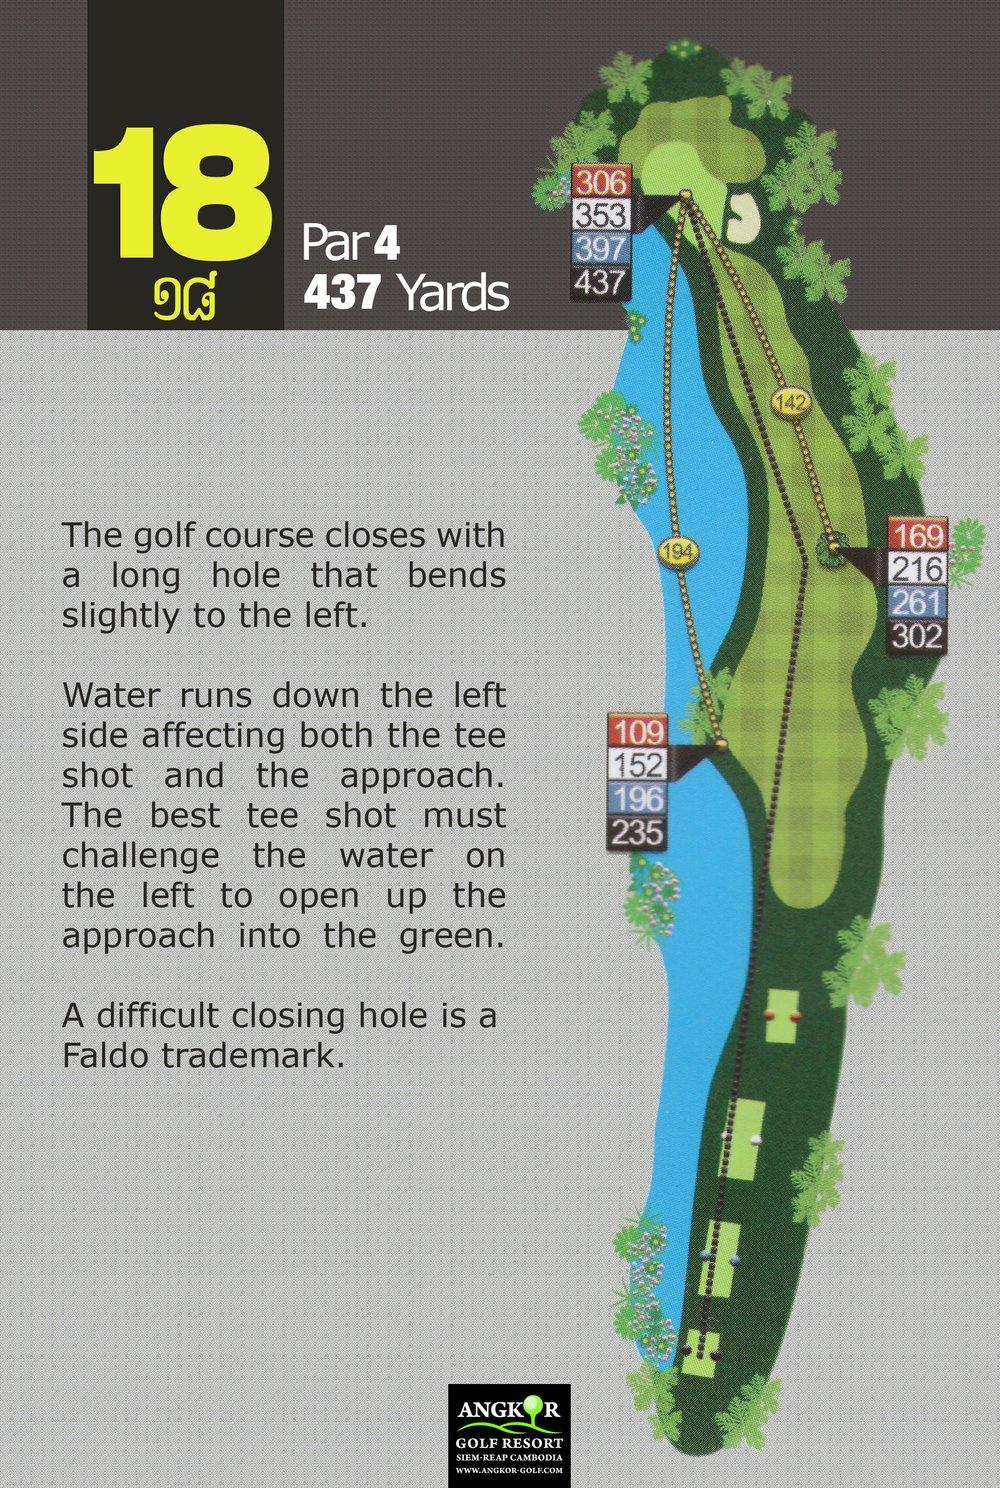 Hole 18 - Par 4 437 Yards